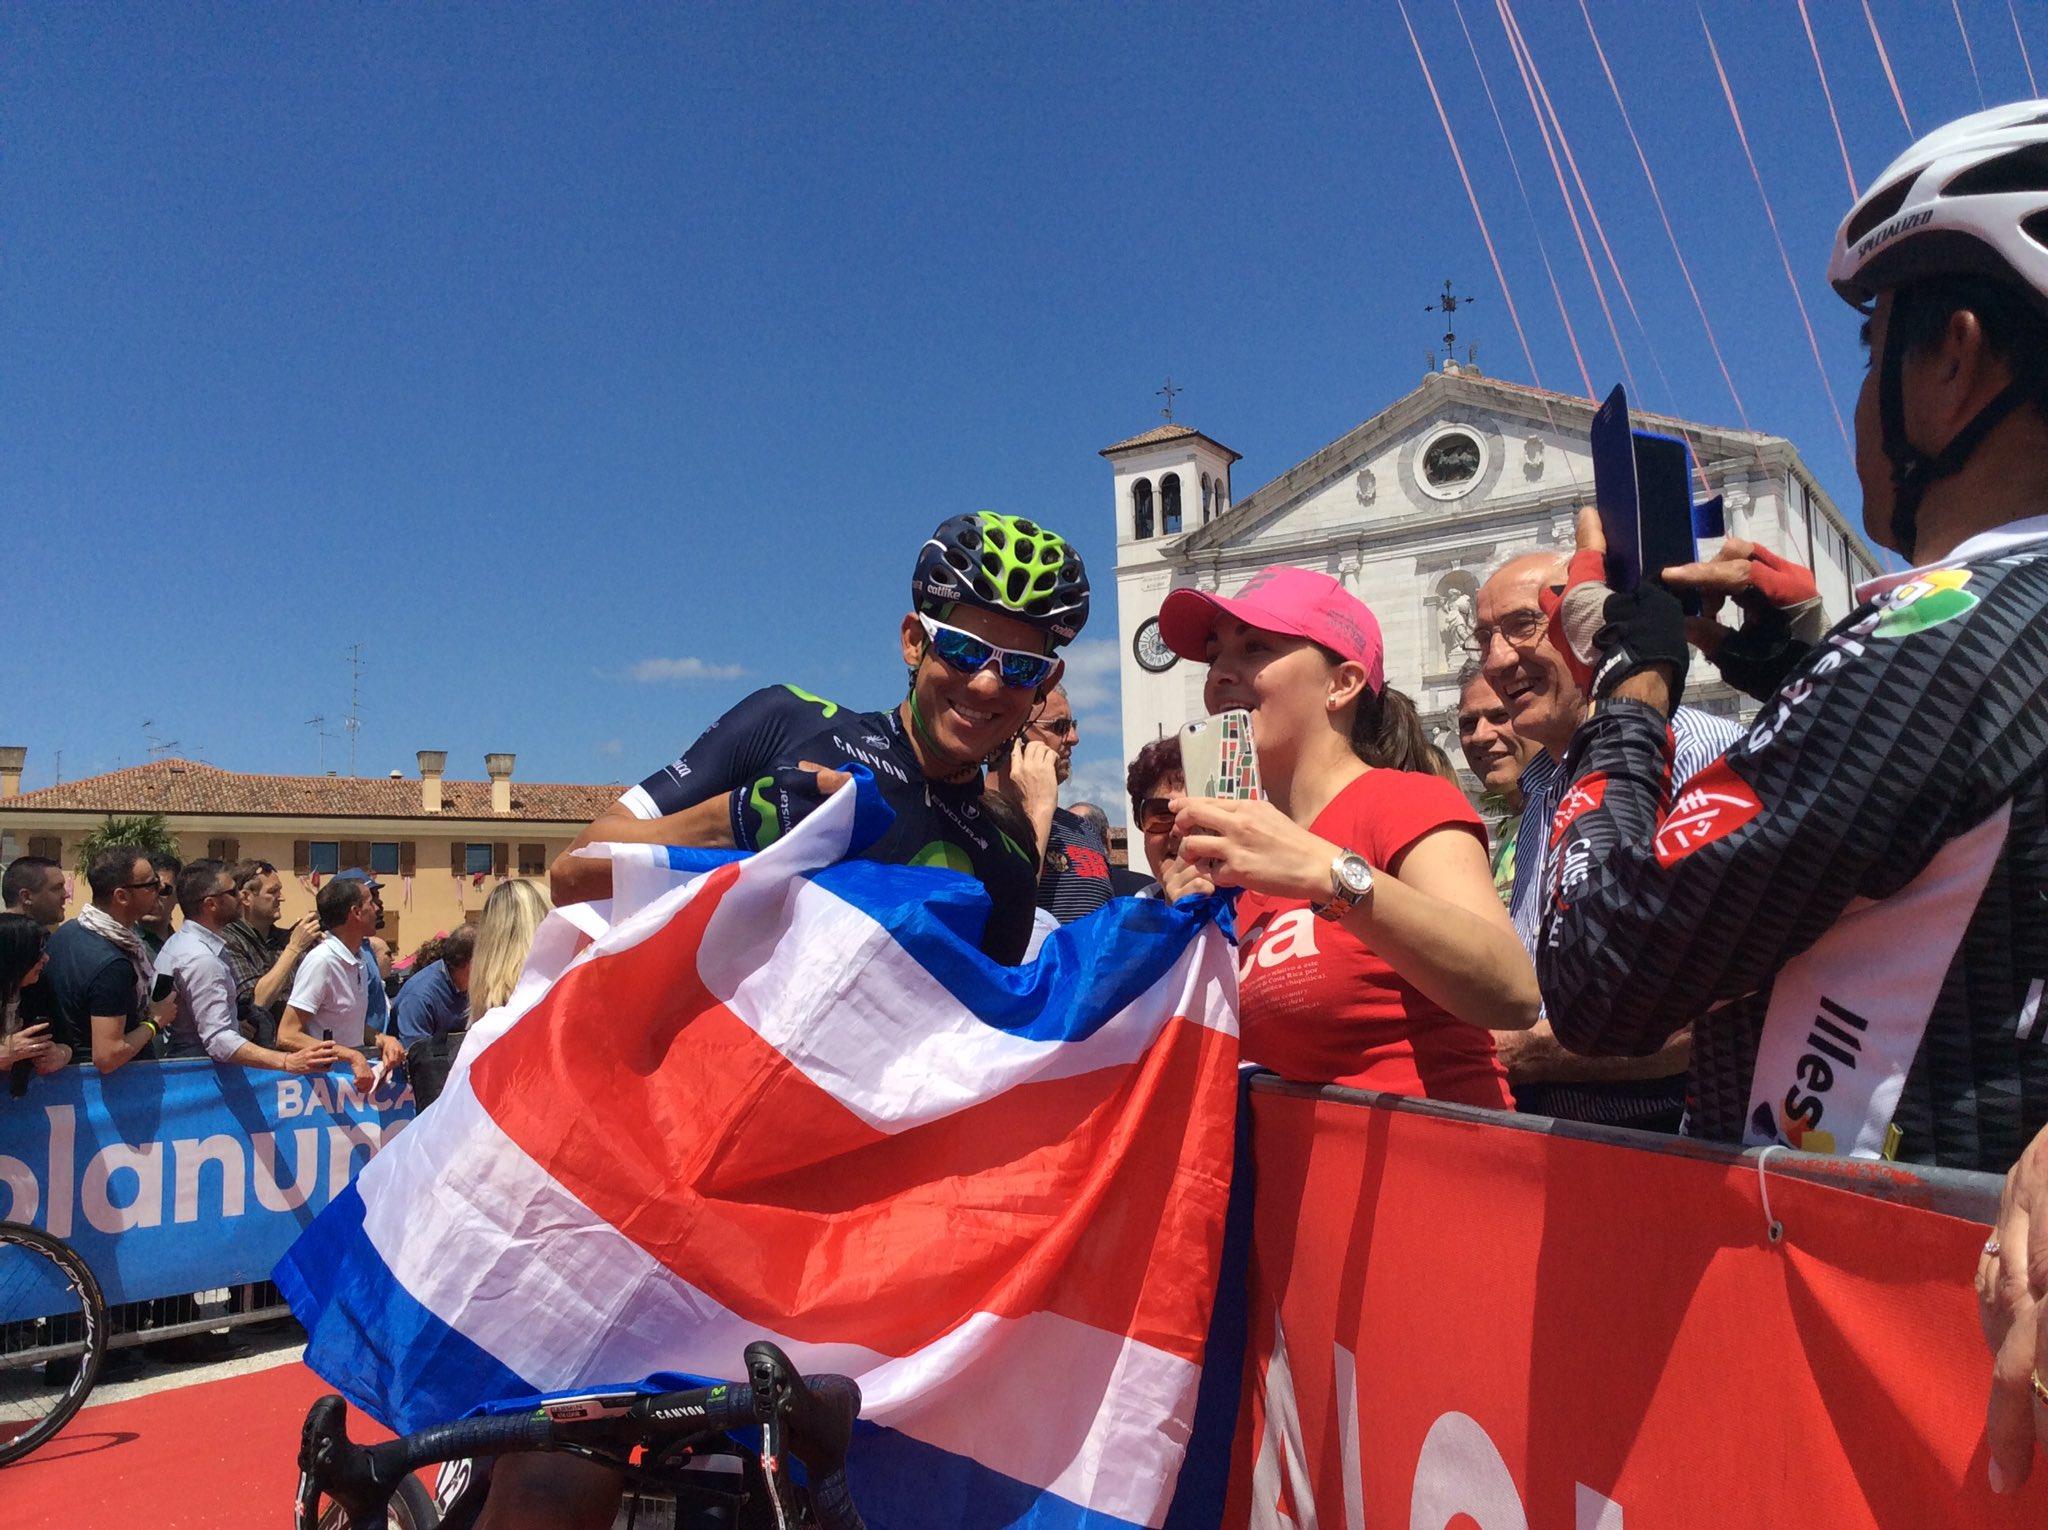 Giro d'Italia, Nieve vince per distacco 13/a tappa